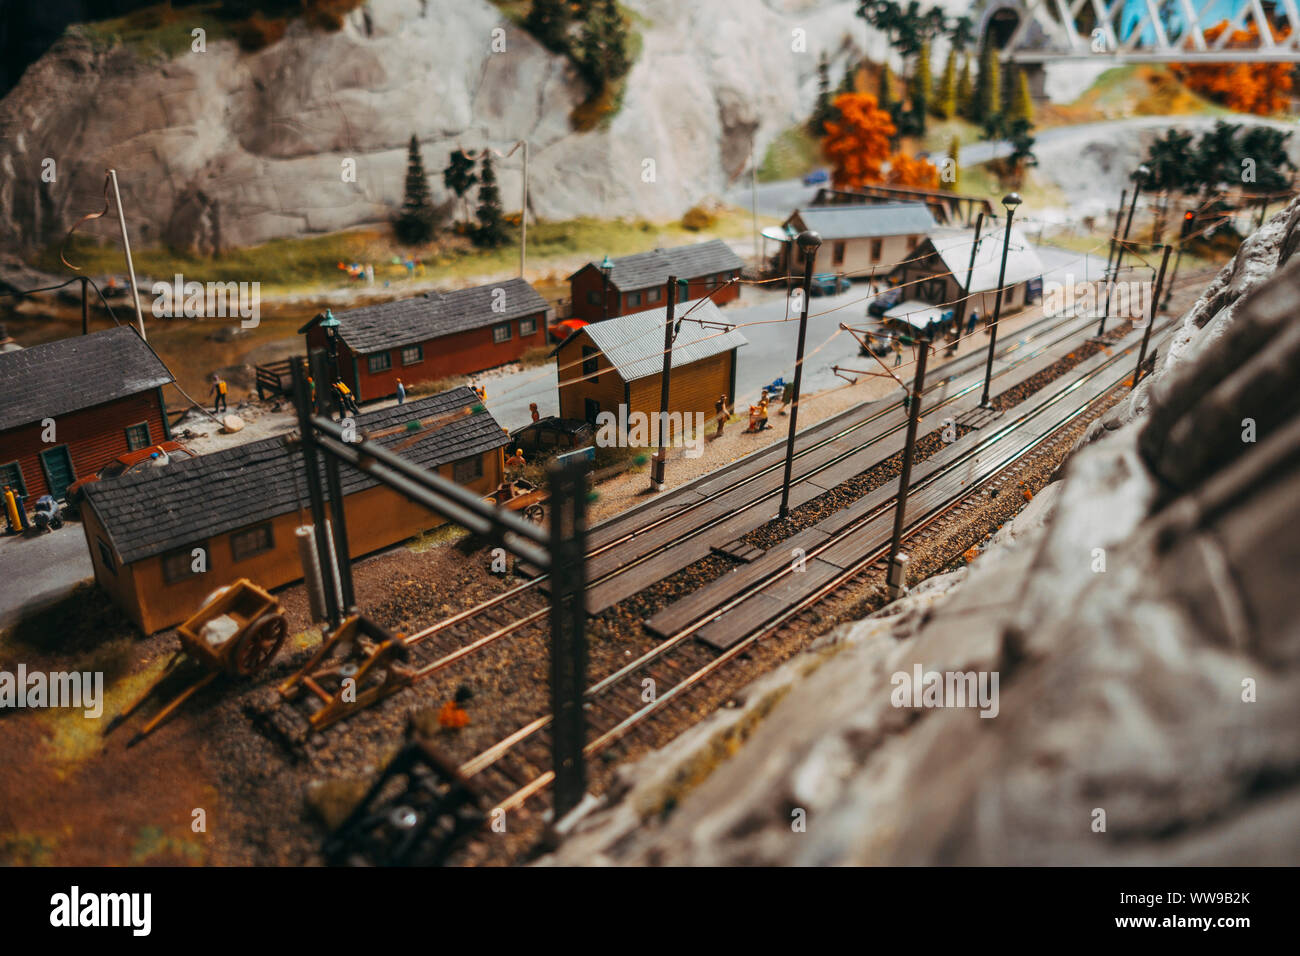 Autumn leaves in a model rail yard at Miniatur Wunderland, Hamburg Stock Photo